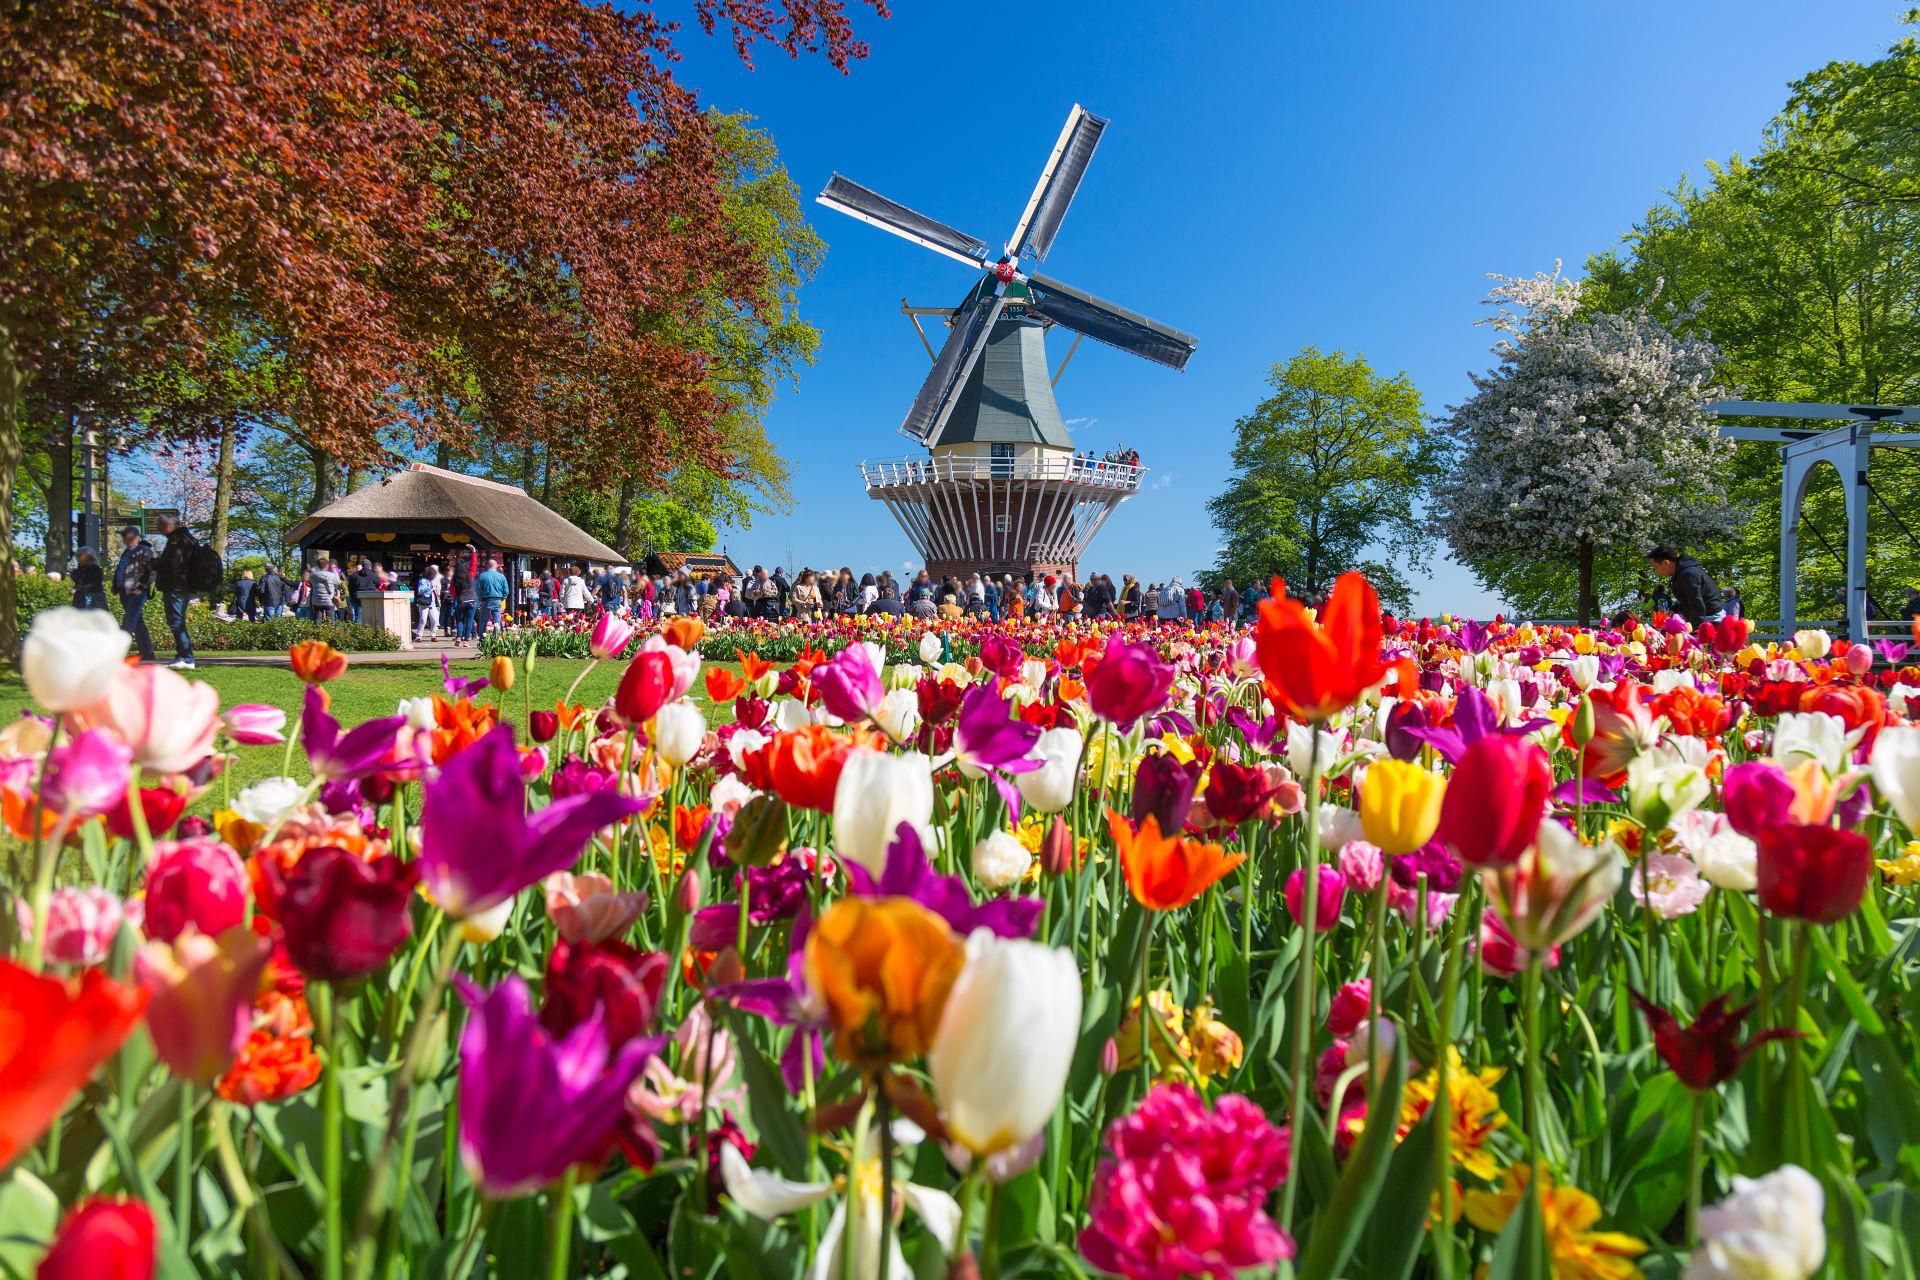 Leiden - The Keukenhof: The Most Beautiful Spring Garden in the World